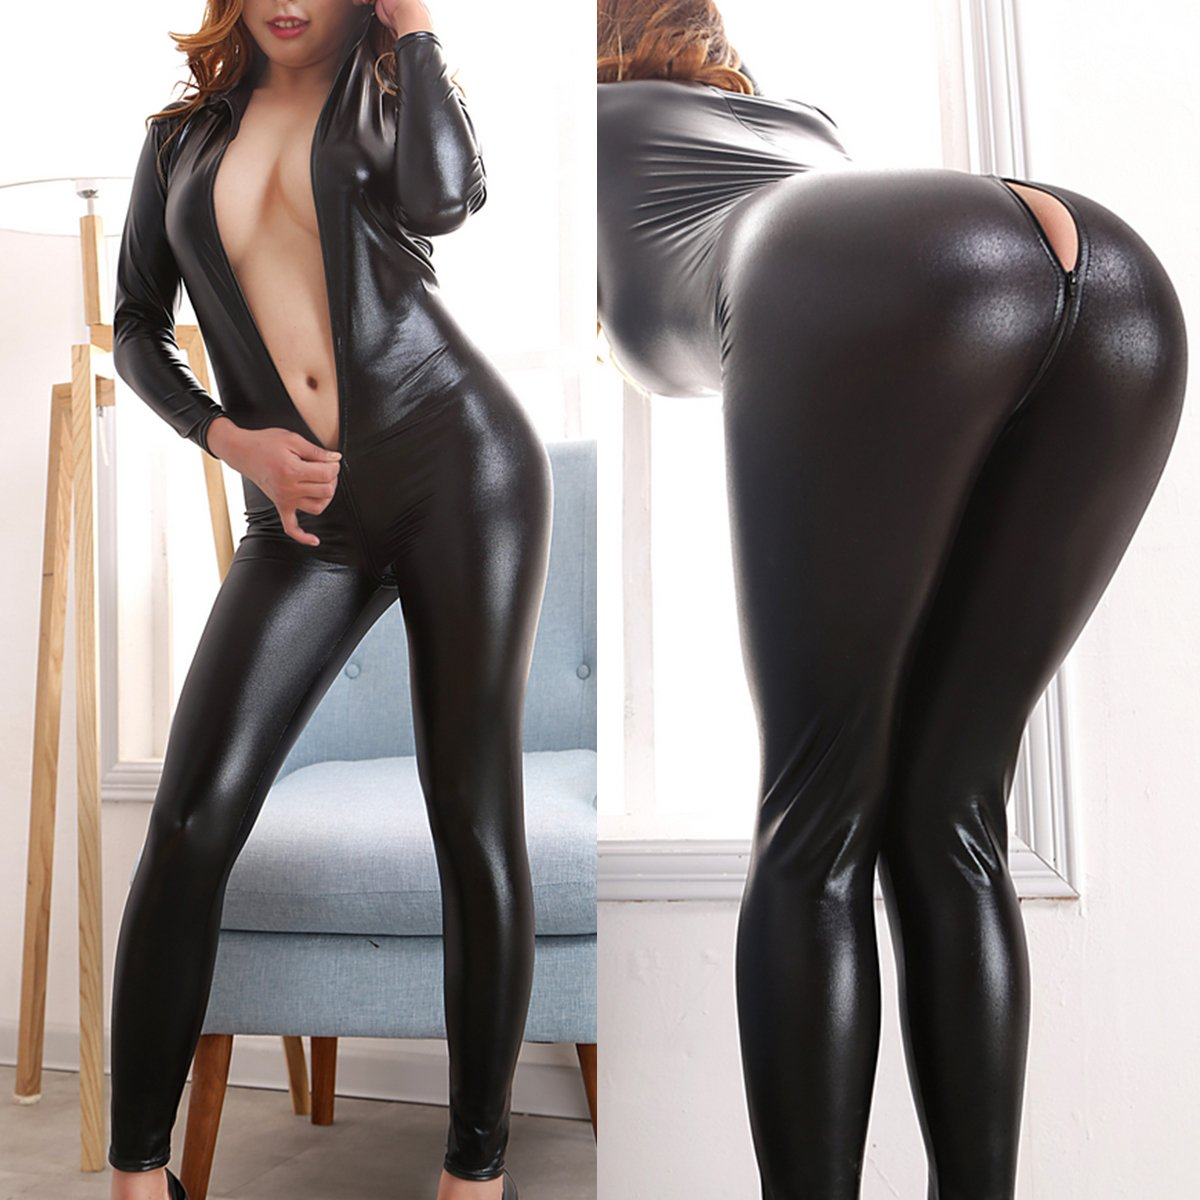 bbf5fa302 Amazon.com: IBTOM CASTLE Leather Jumpsuit Womens Catsuit Metallic Teddy  Gothic Fetish Bodysuit Lingerie Clubwear Party Costume: Clothing